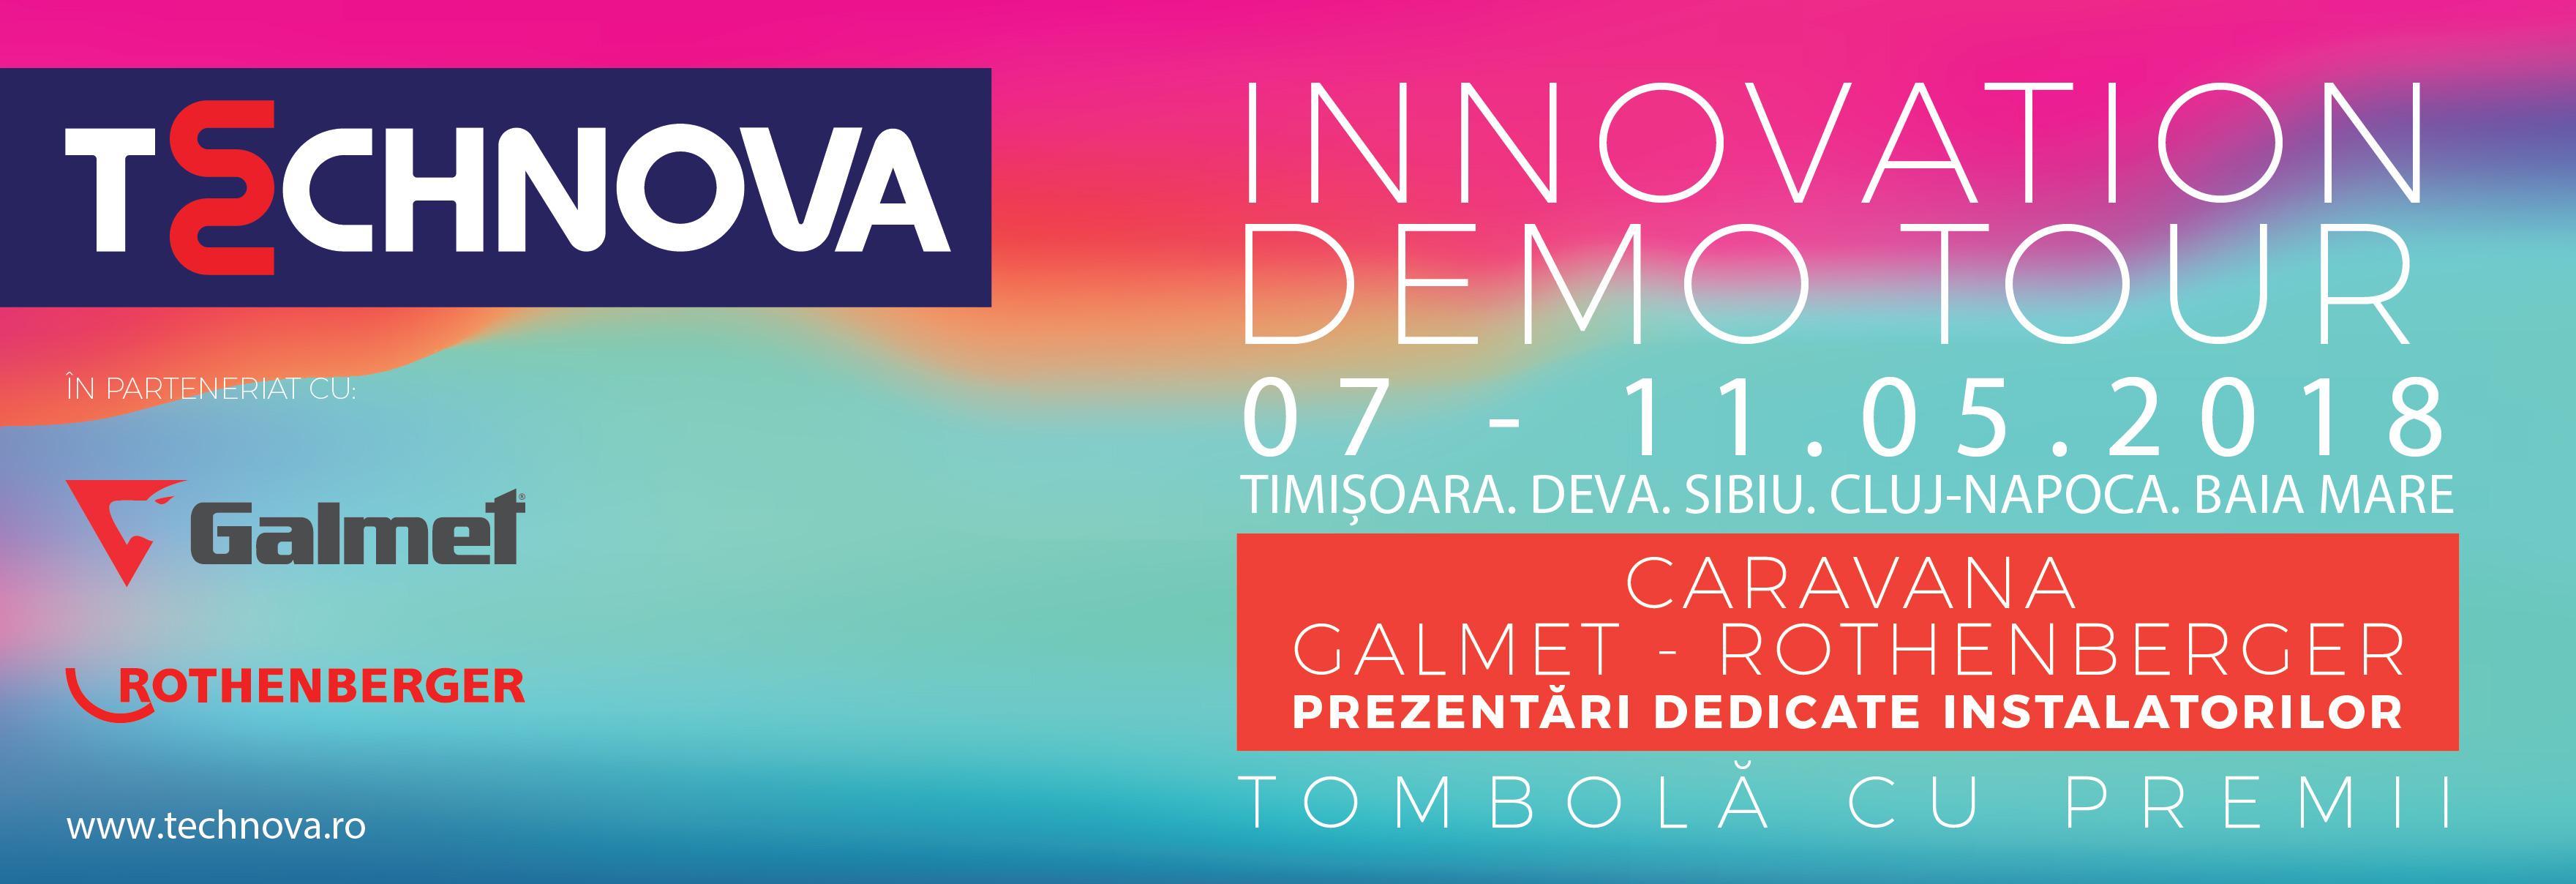 Caravana Galmet - Rothenberger - Technova Invest - Innovation Demo Tour - 07-11.05.18 - prezentari dedicate instalatorilor - tombola cu premii Rothenberger - Timisoara - Deva - Sibiu - Cluj-Napoca - Baia Mare